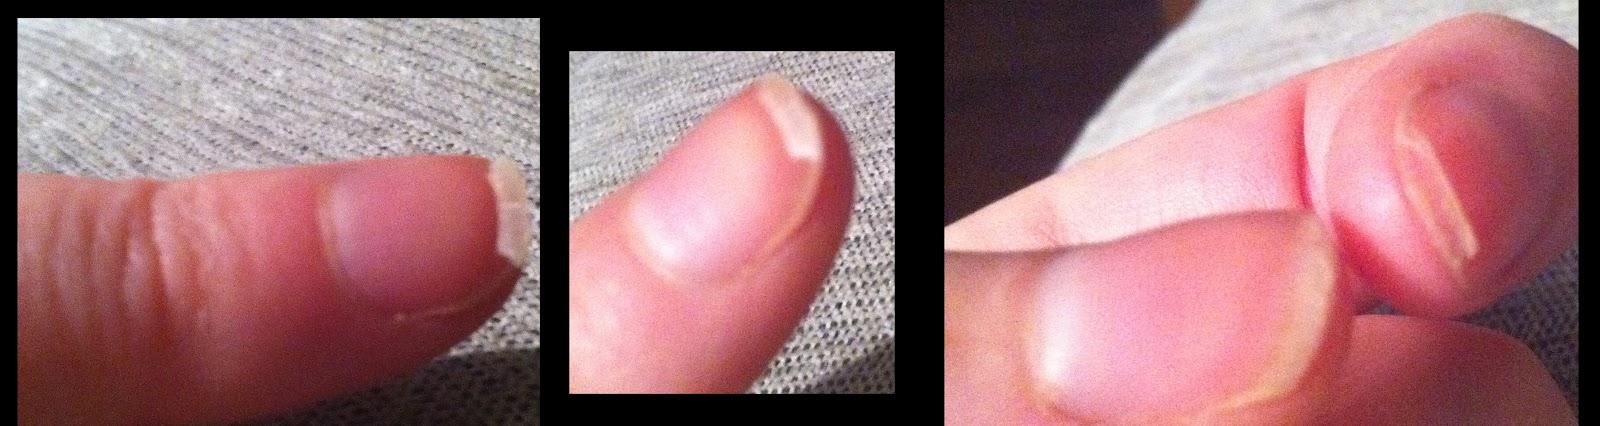 rimmel nail rescue 2 week treatment instructions